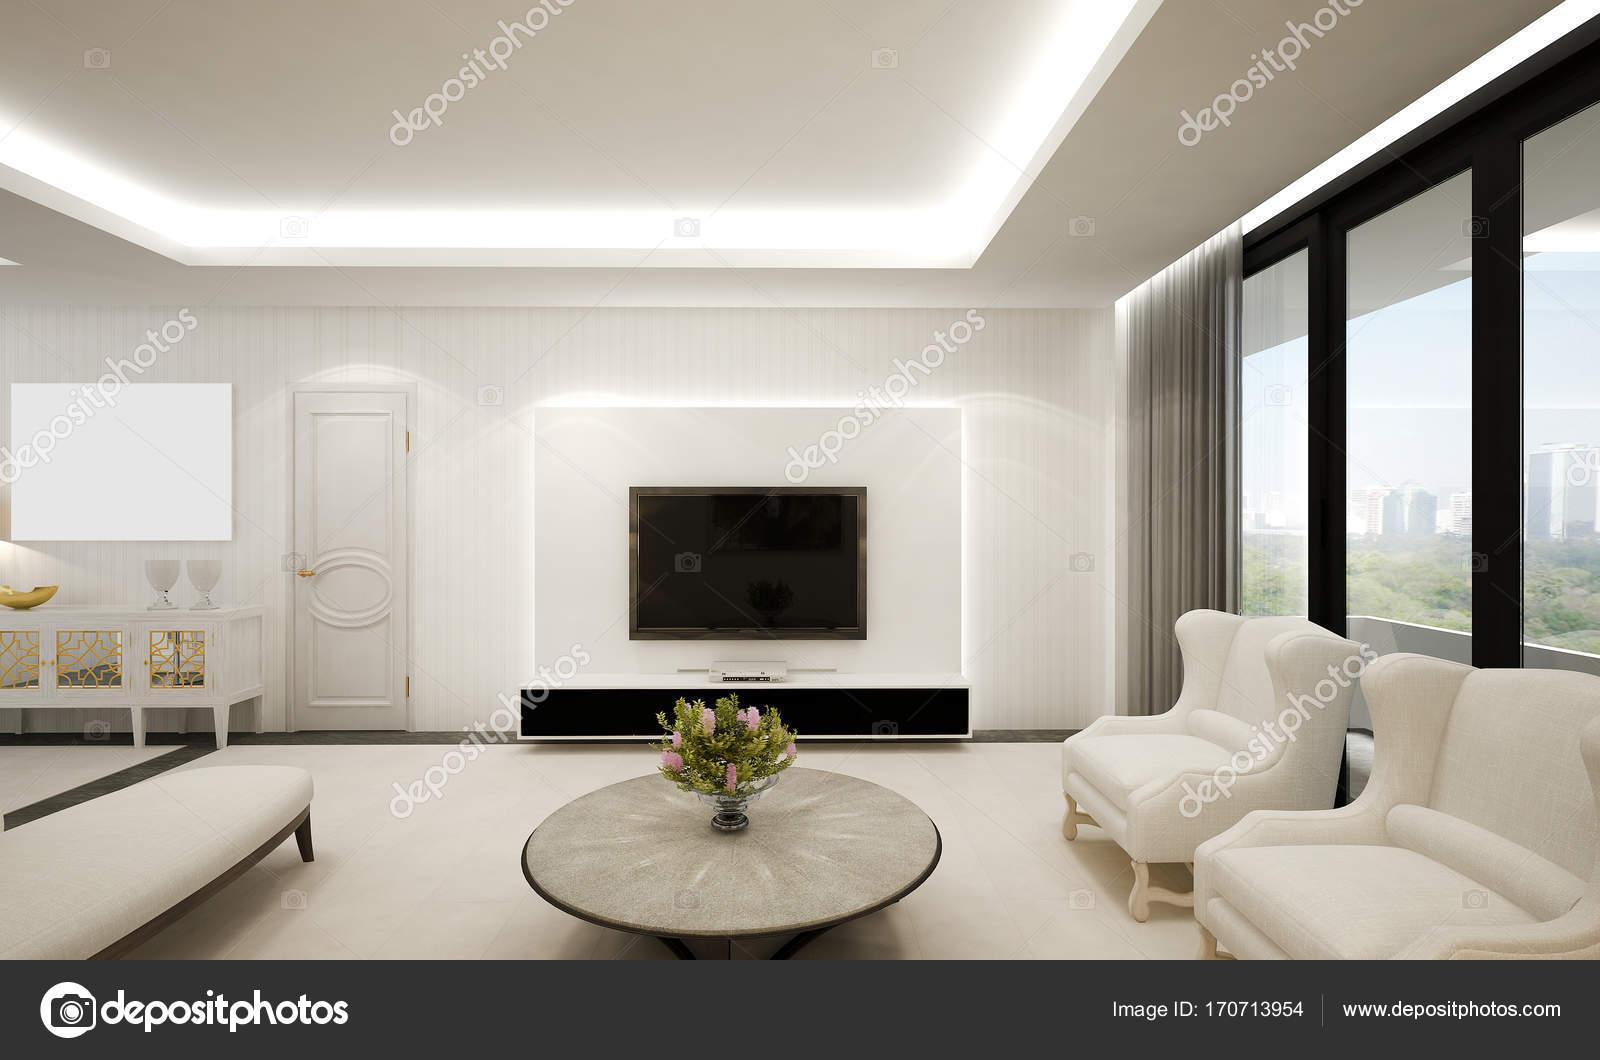 De moderne luxe woonkamer en witte muur patroon design for Woonkamer design